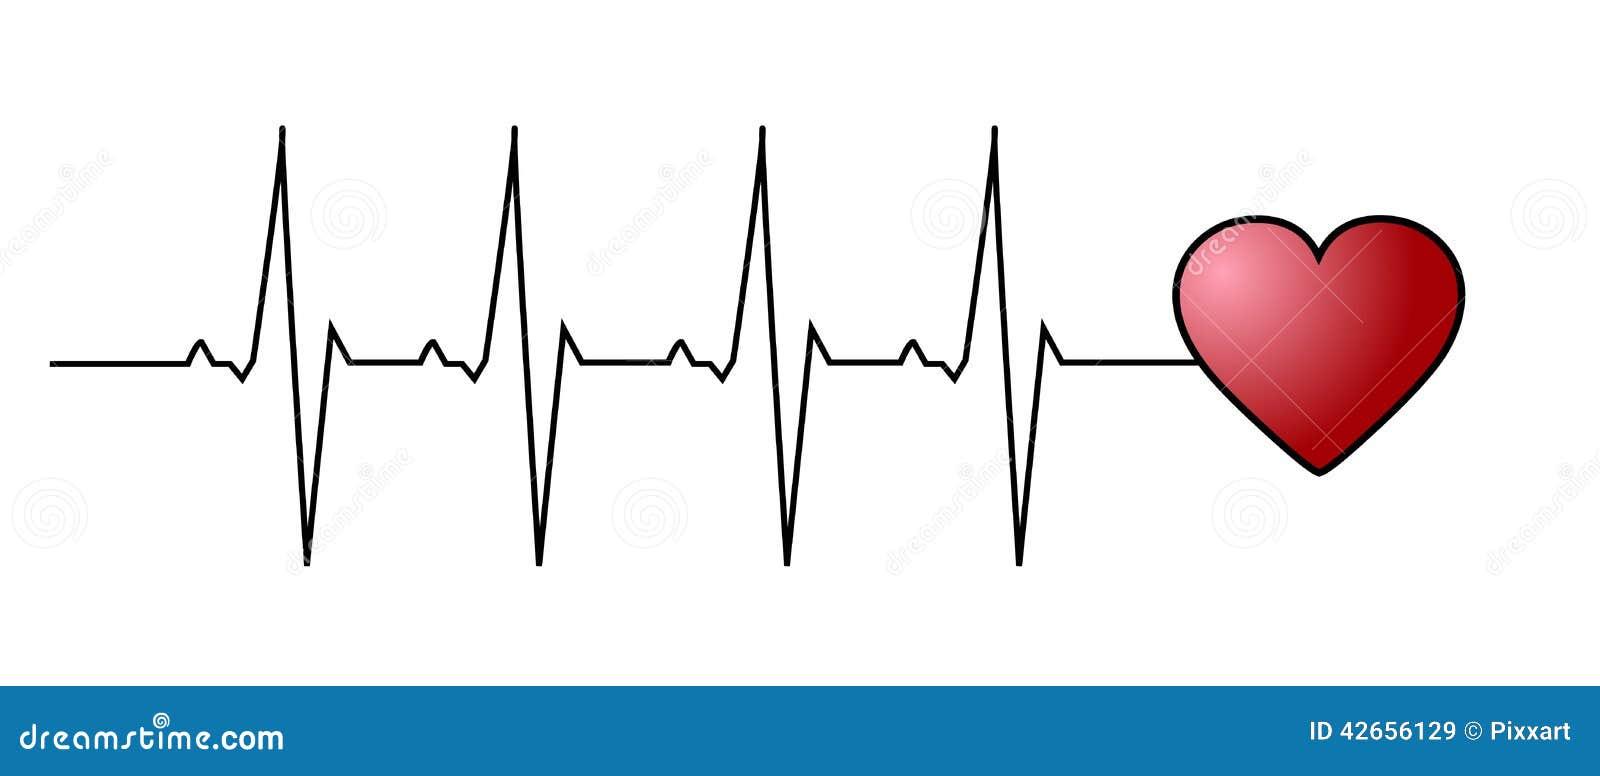 Love Heart Beat Stock Vector Image 42656129